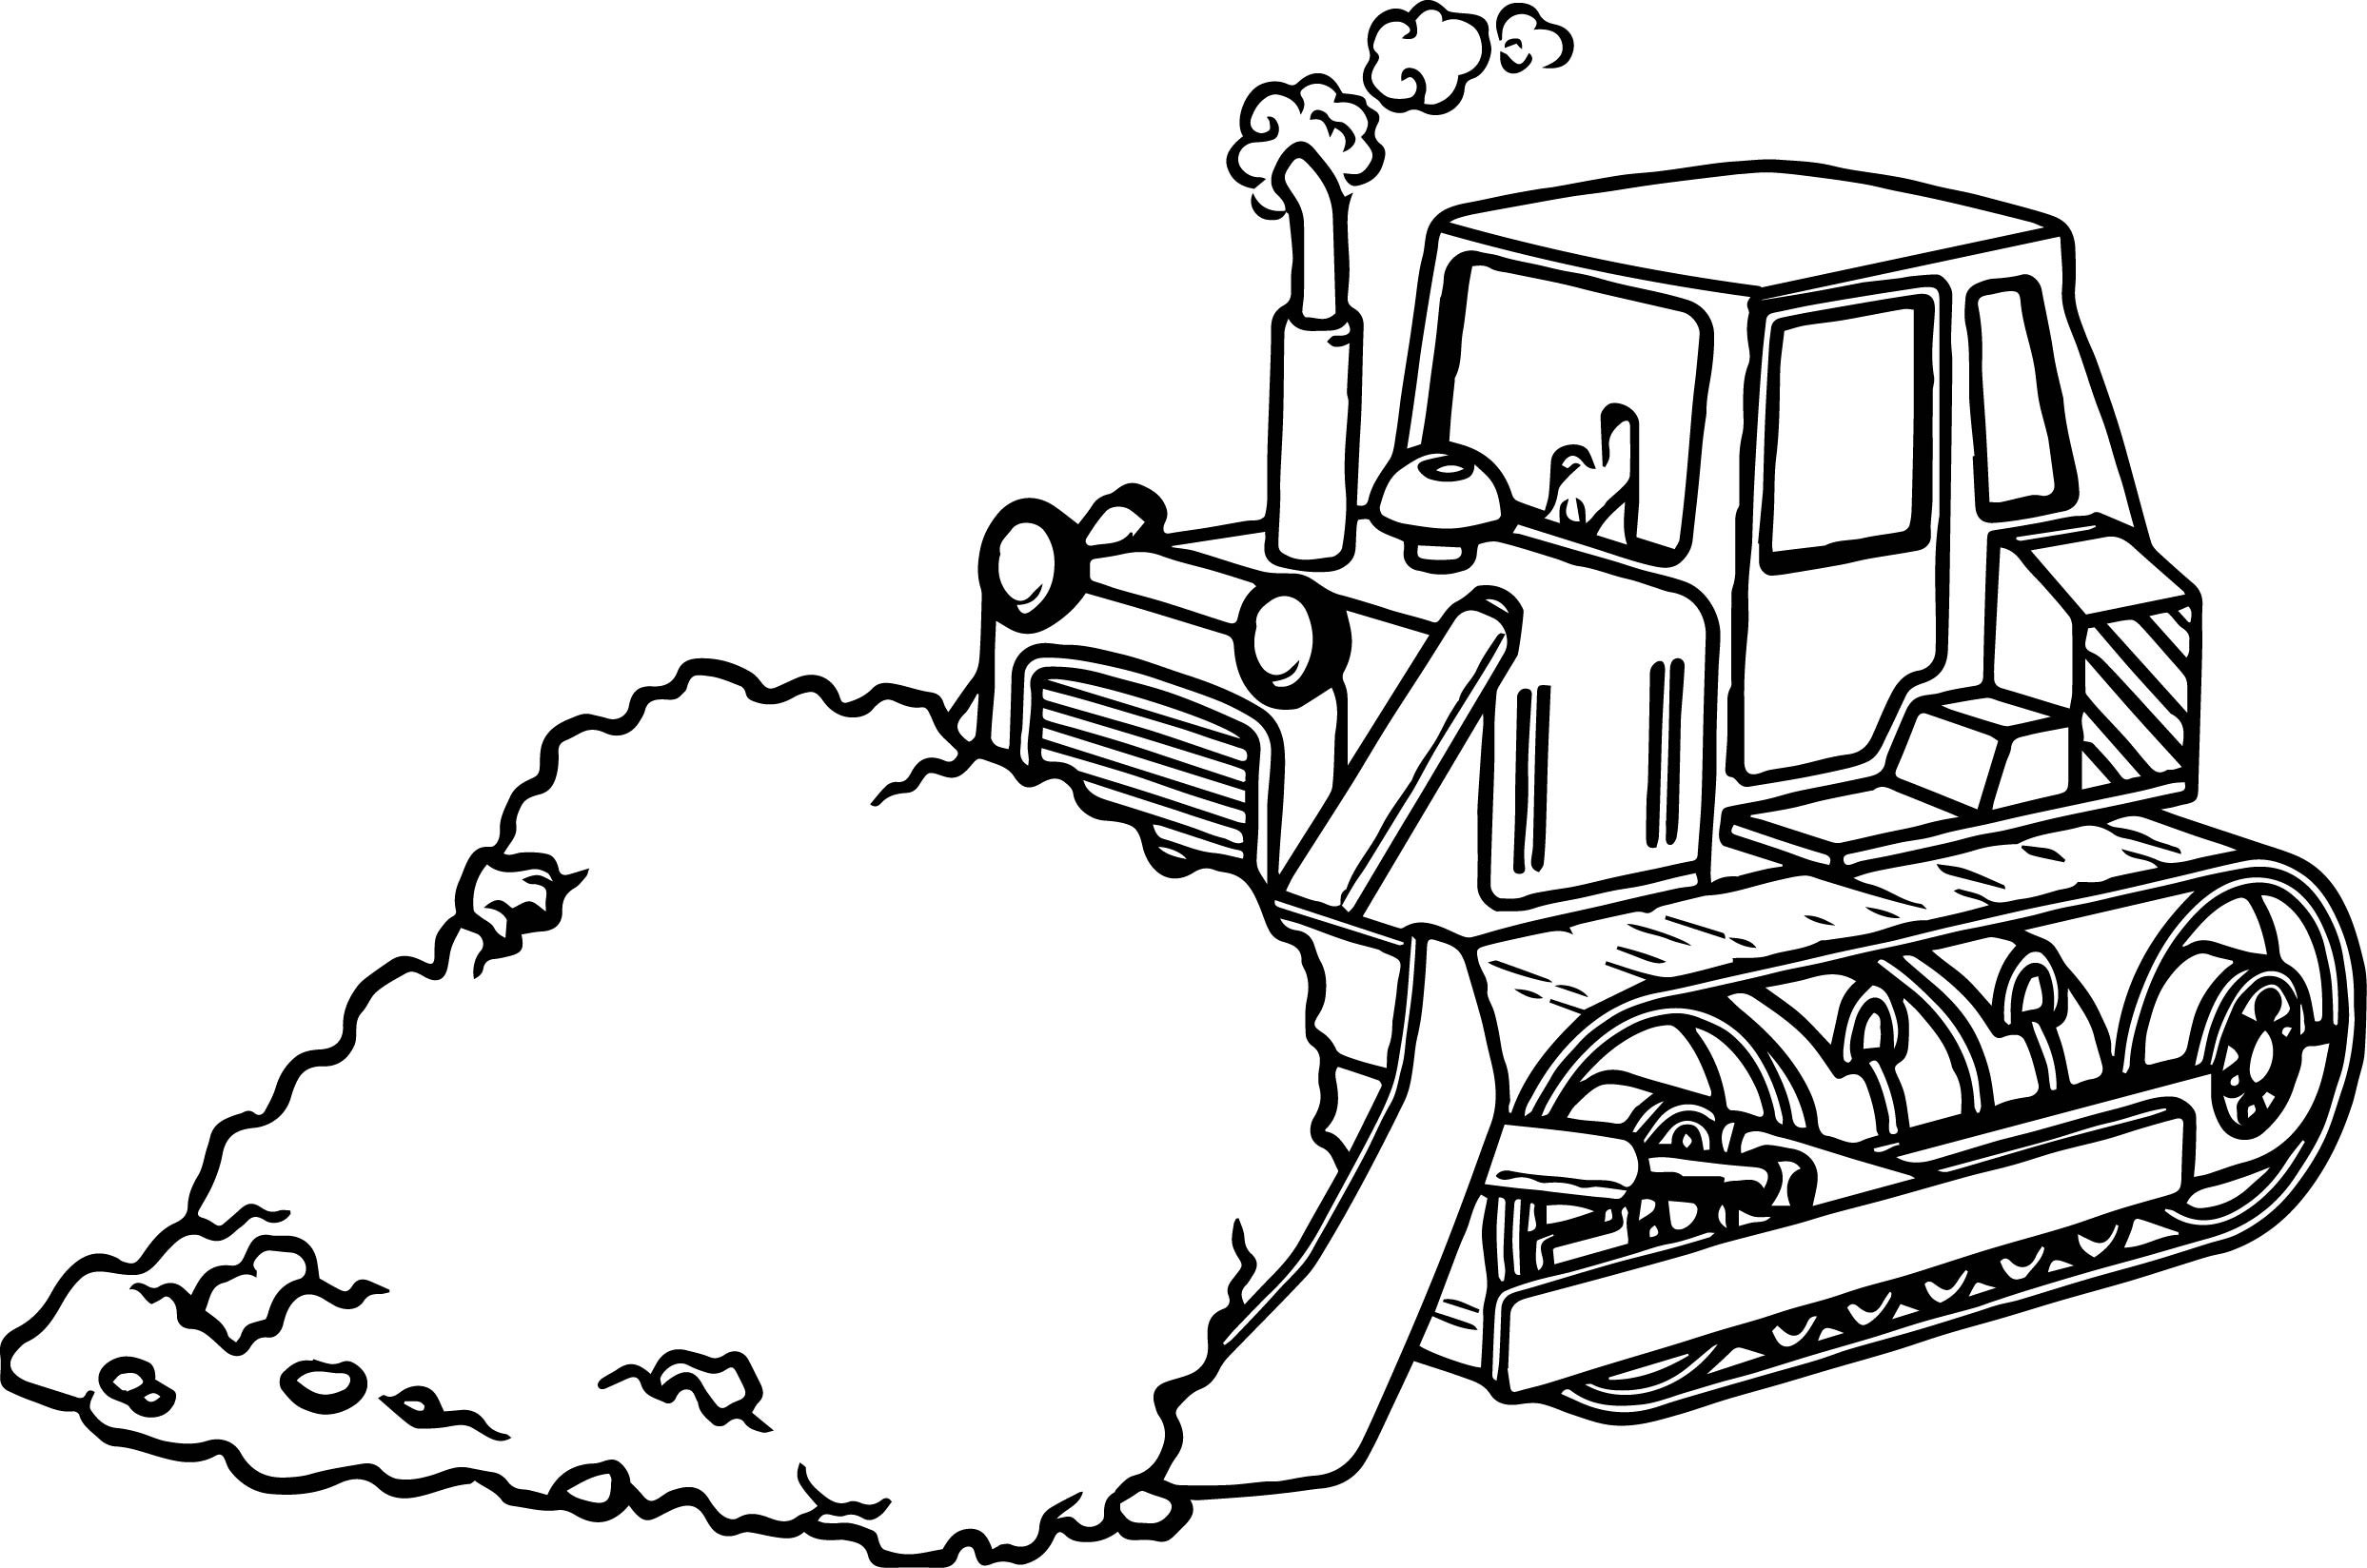 Bulldozer clipart color. Backhoe coloring page jkfloodrelief